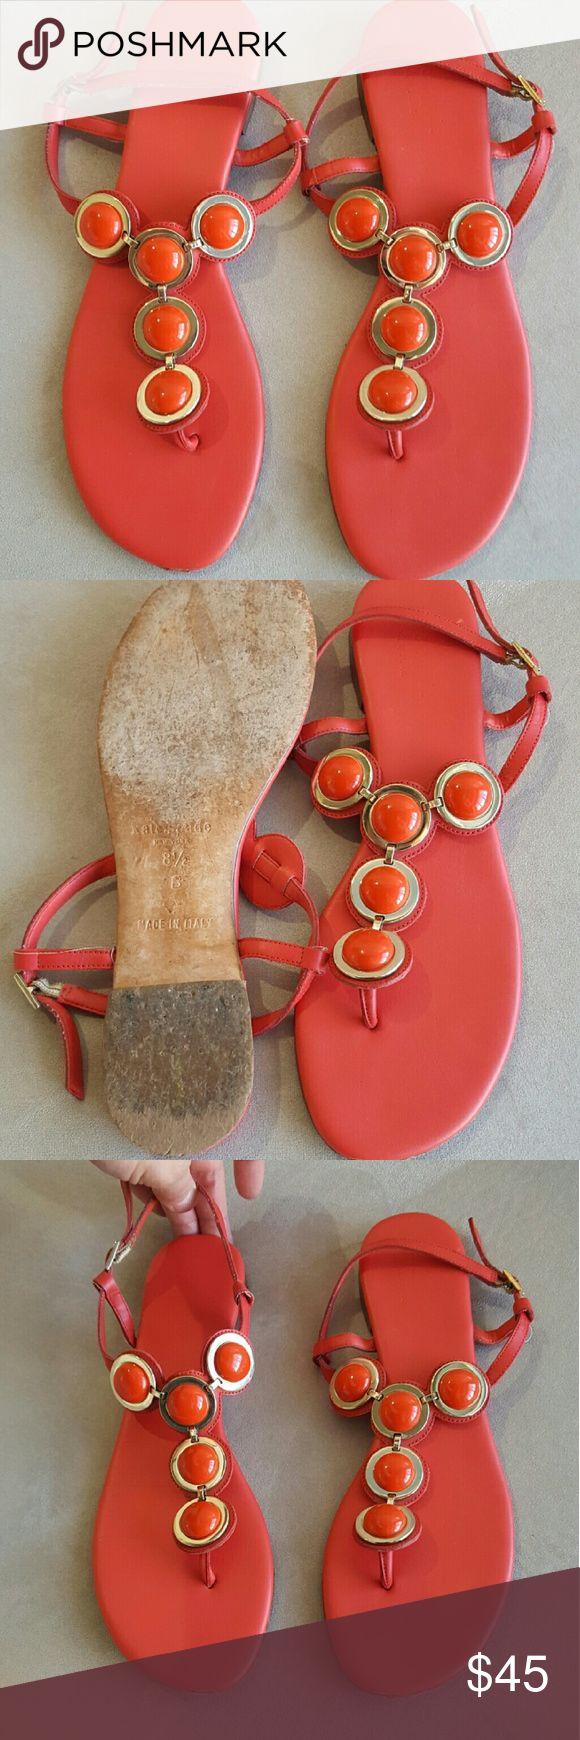 Women's Kate Spade coral sandals, size 8.5 Women's coral and gold Kate Spade sandals. Size 8.5 kate spade Shoes Sandals